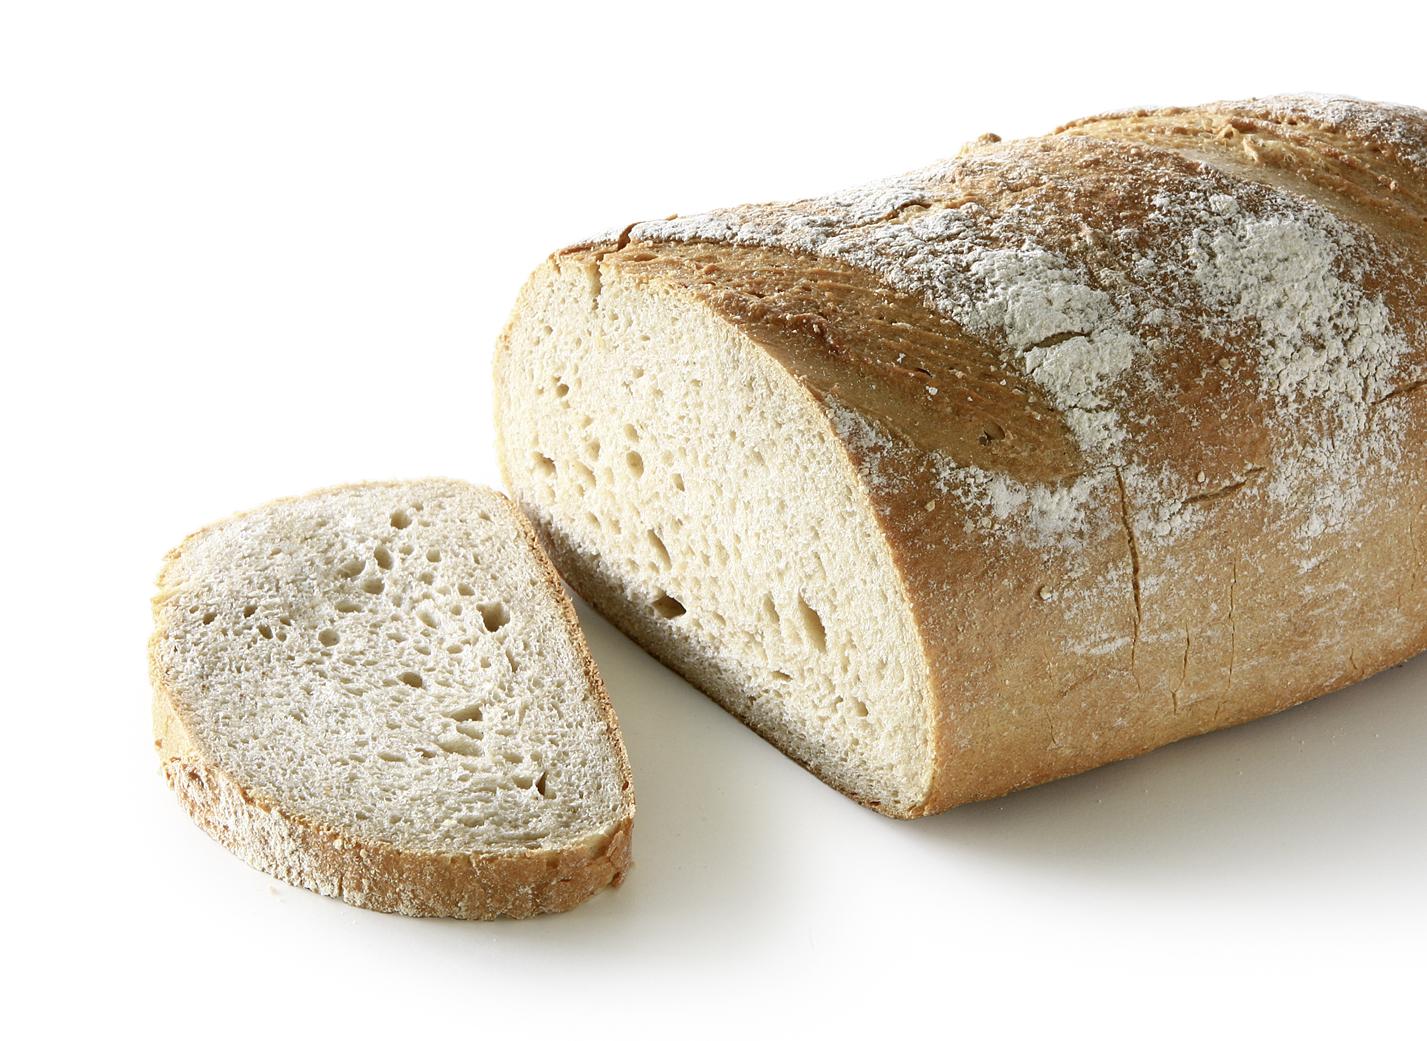 Wheat mixed Bread - With 55% wheat flour length: 31.5 cm